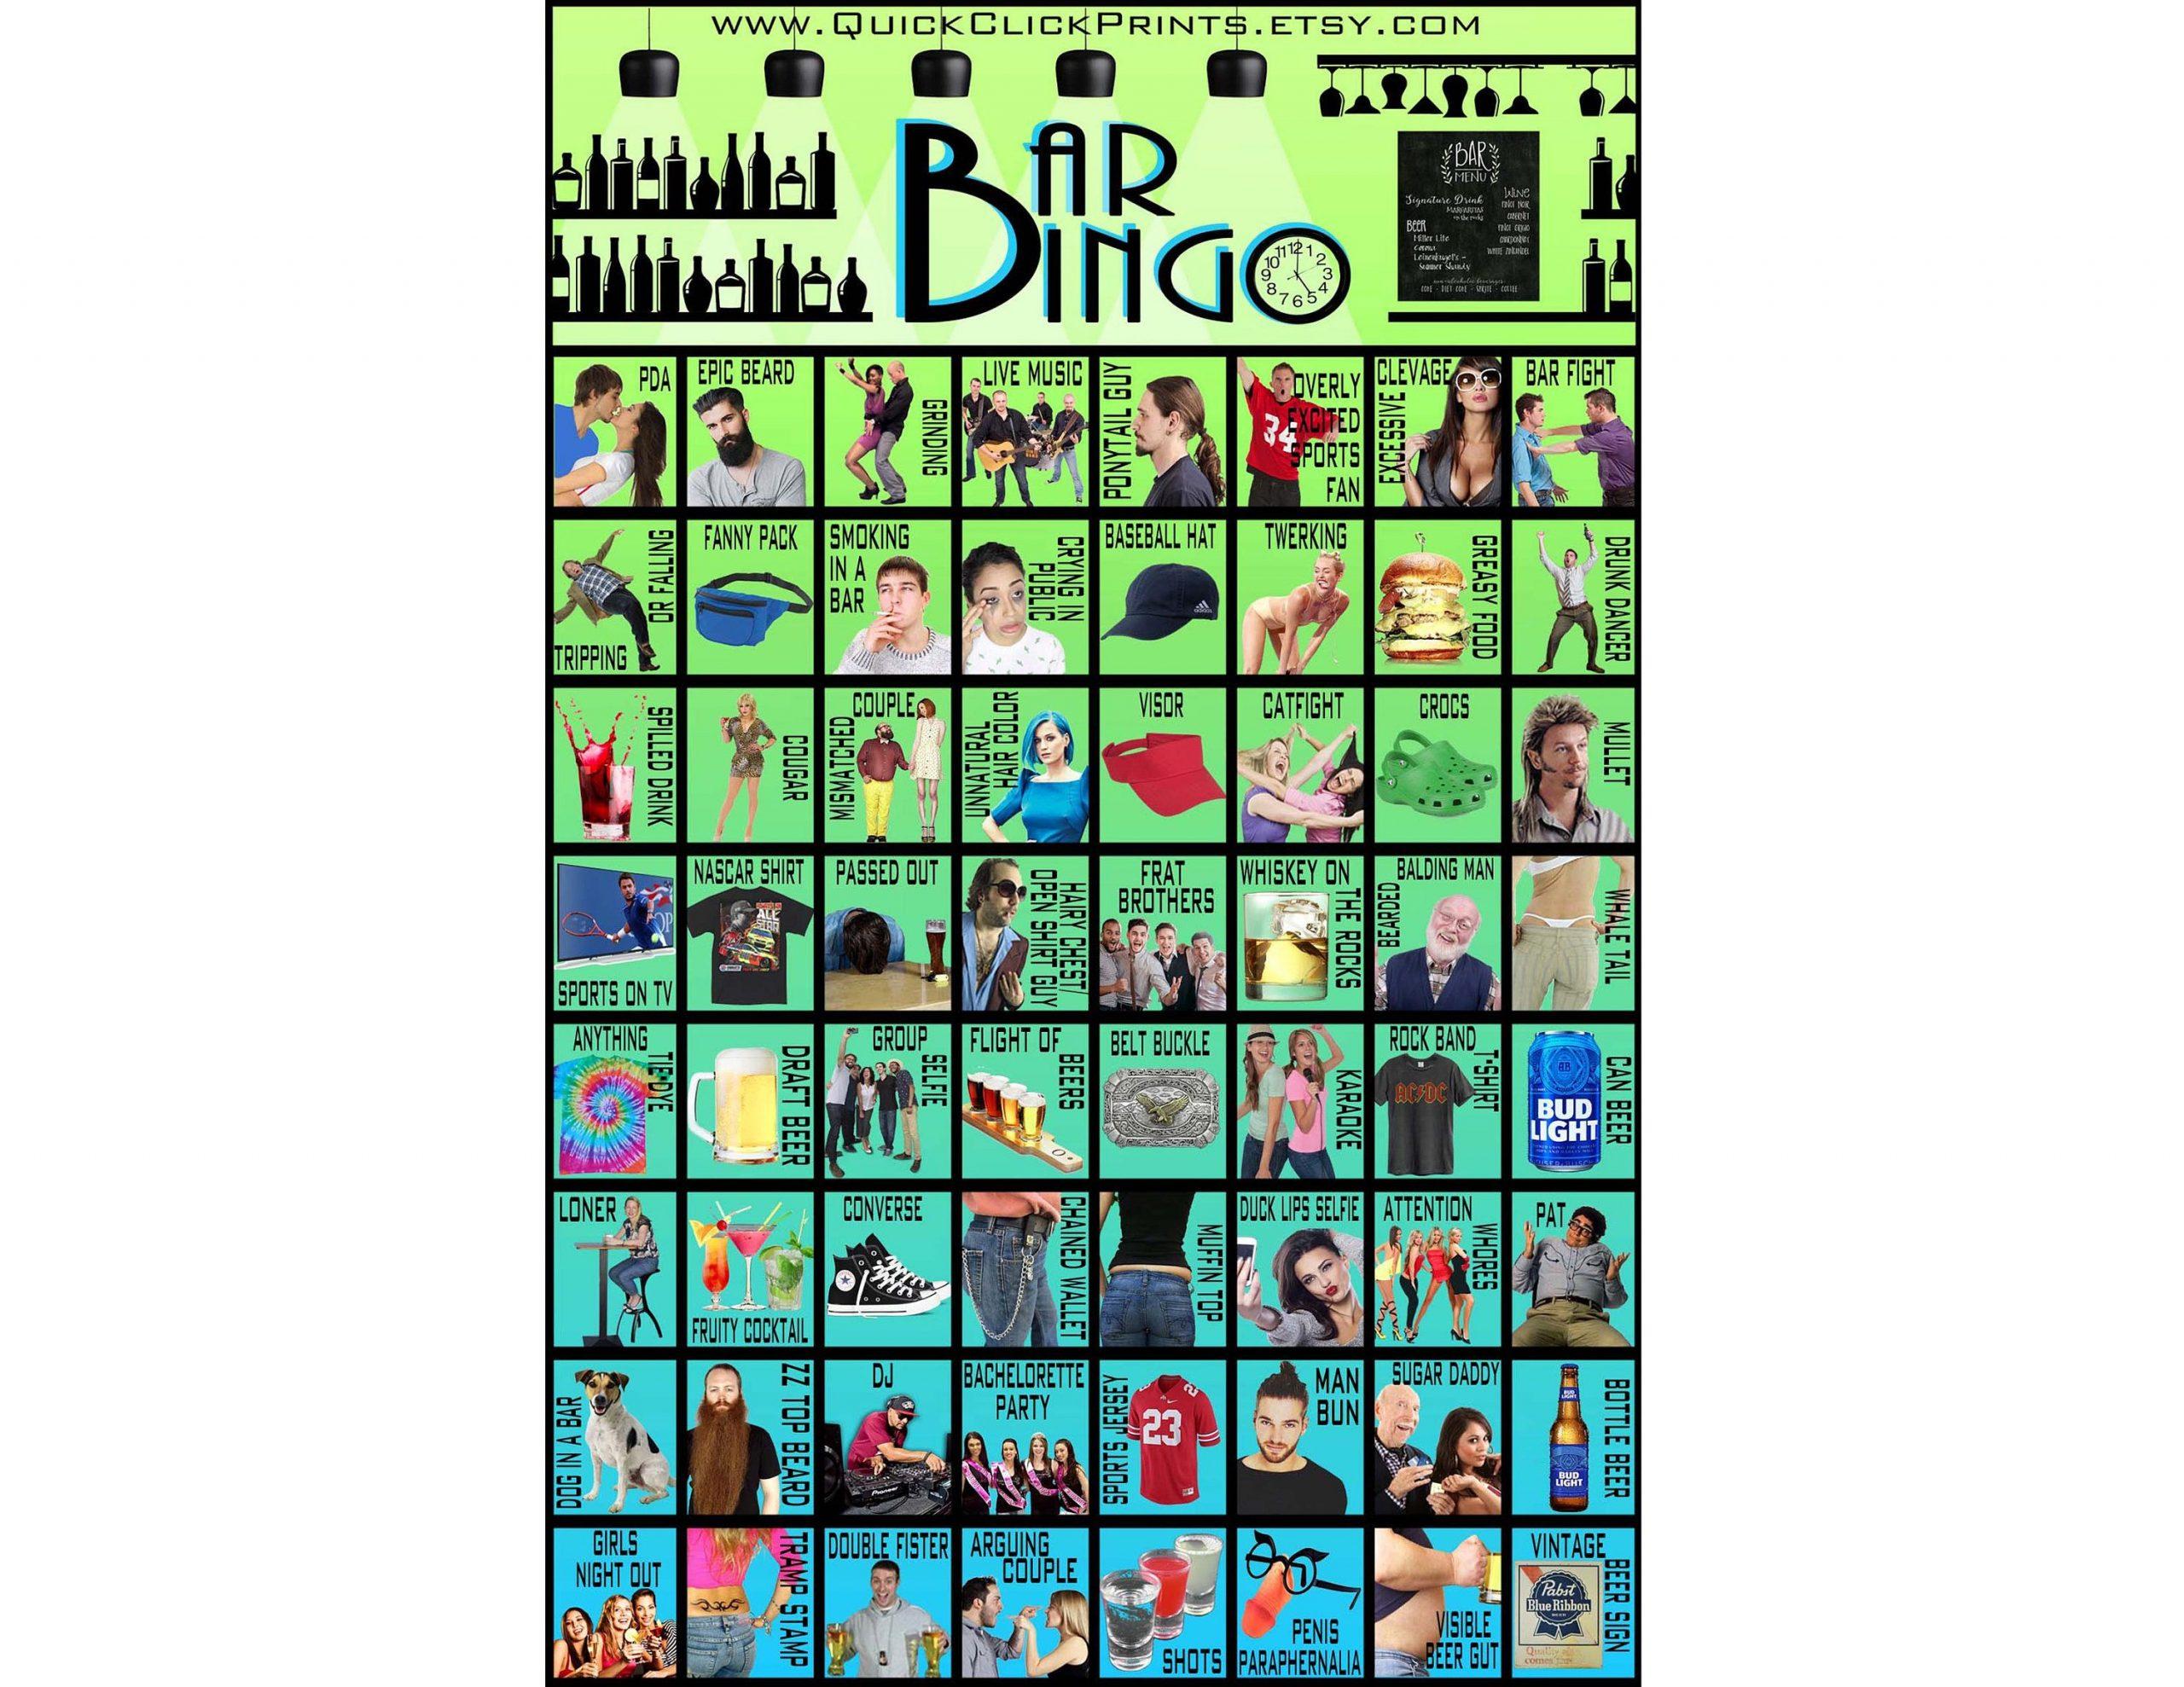 Big Bar Bingo -30 Cards -Pub Crawl Bingo -People Watching